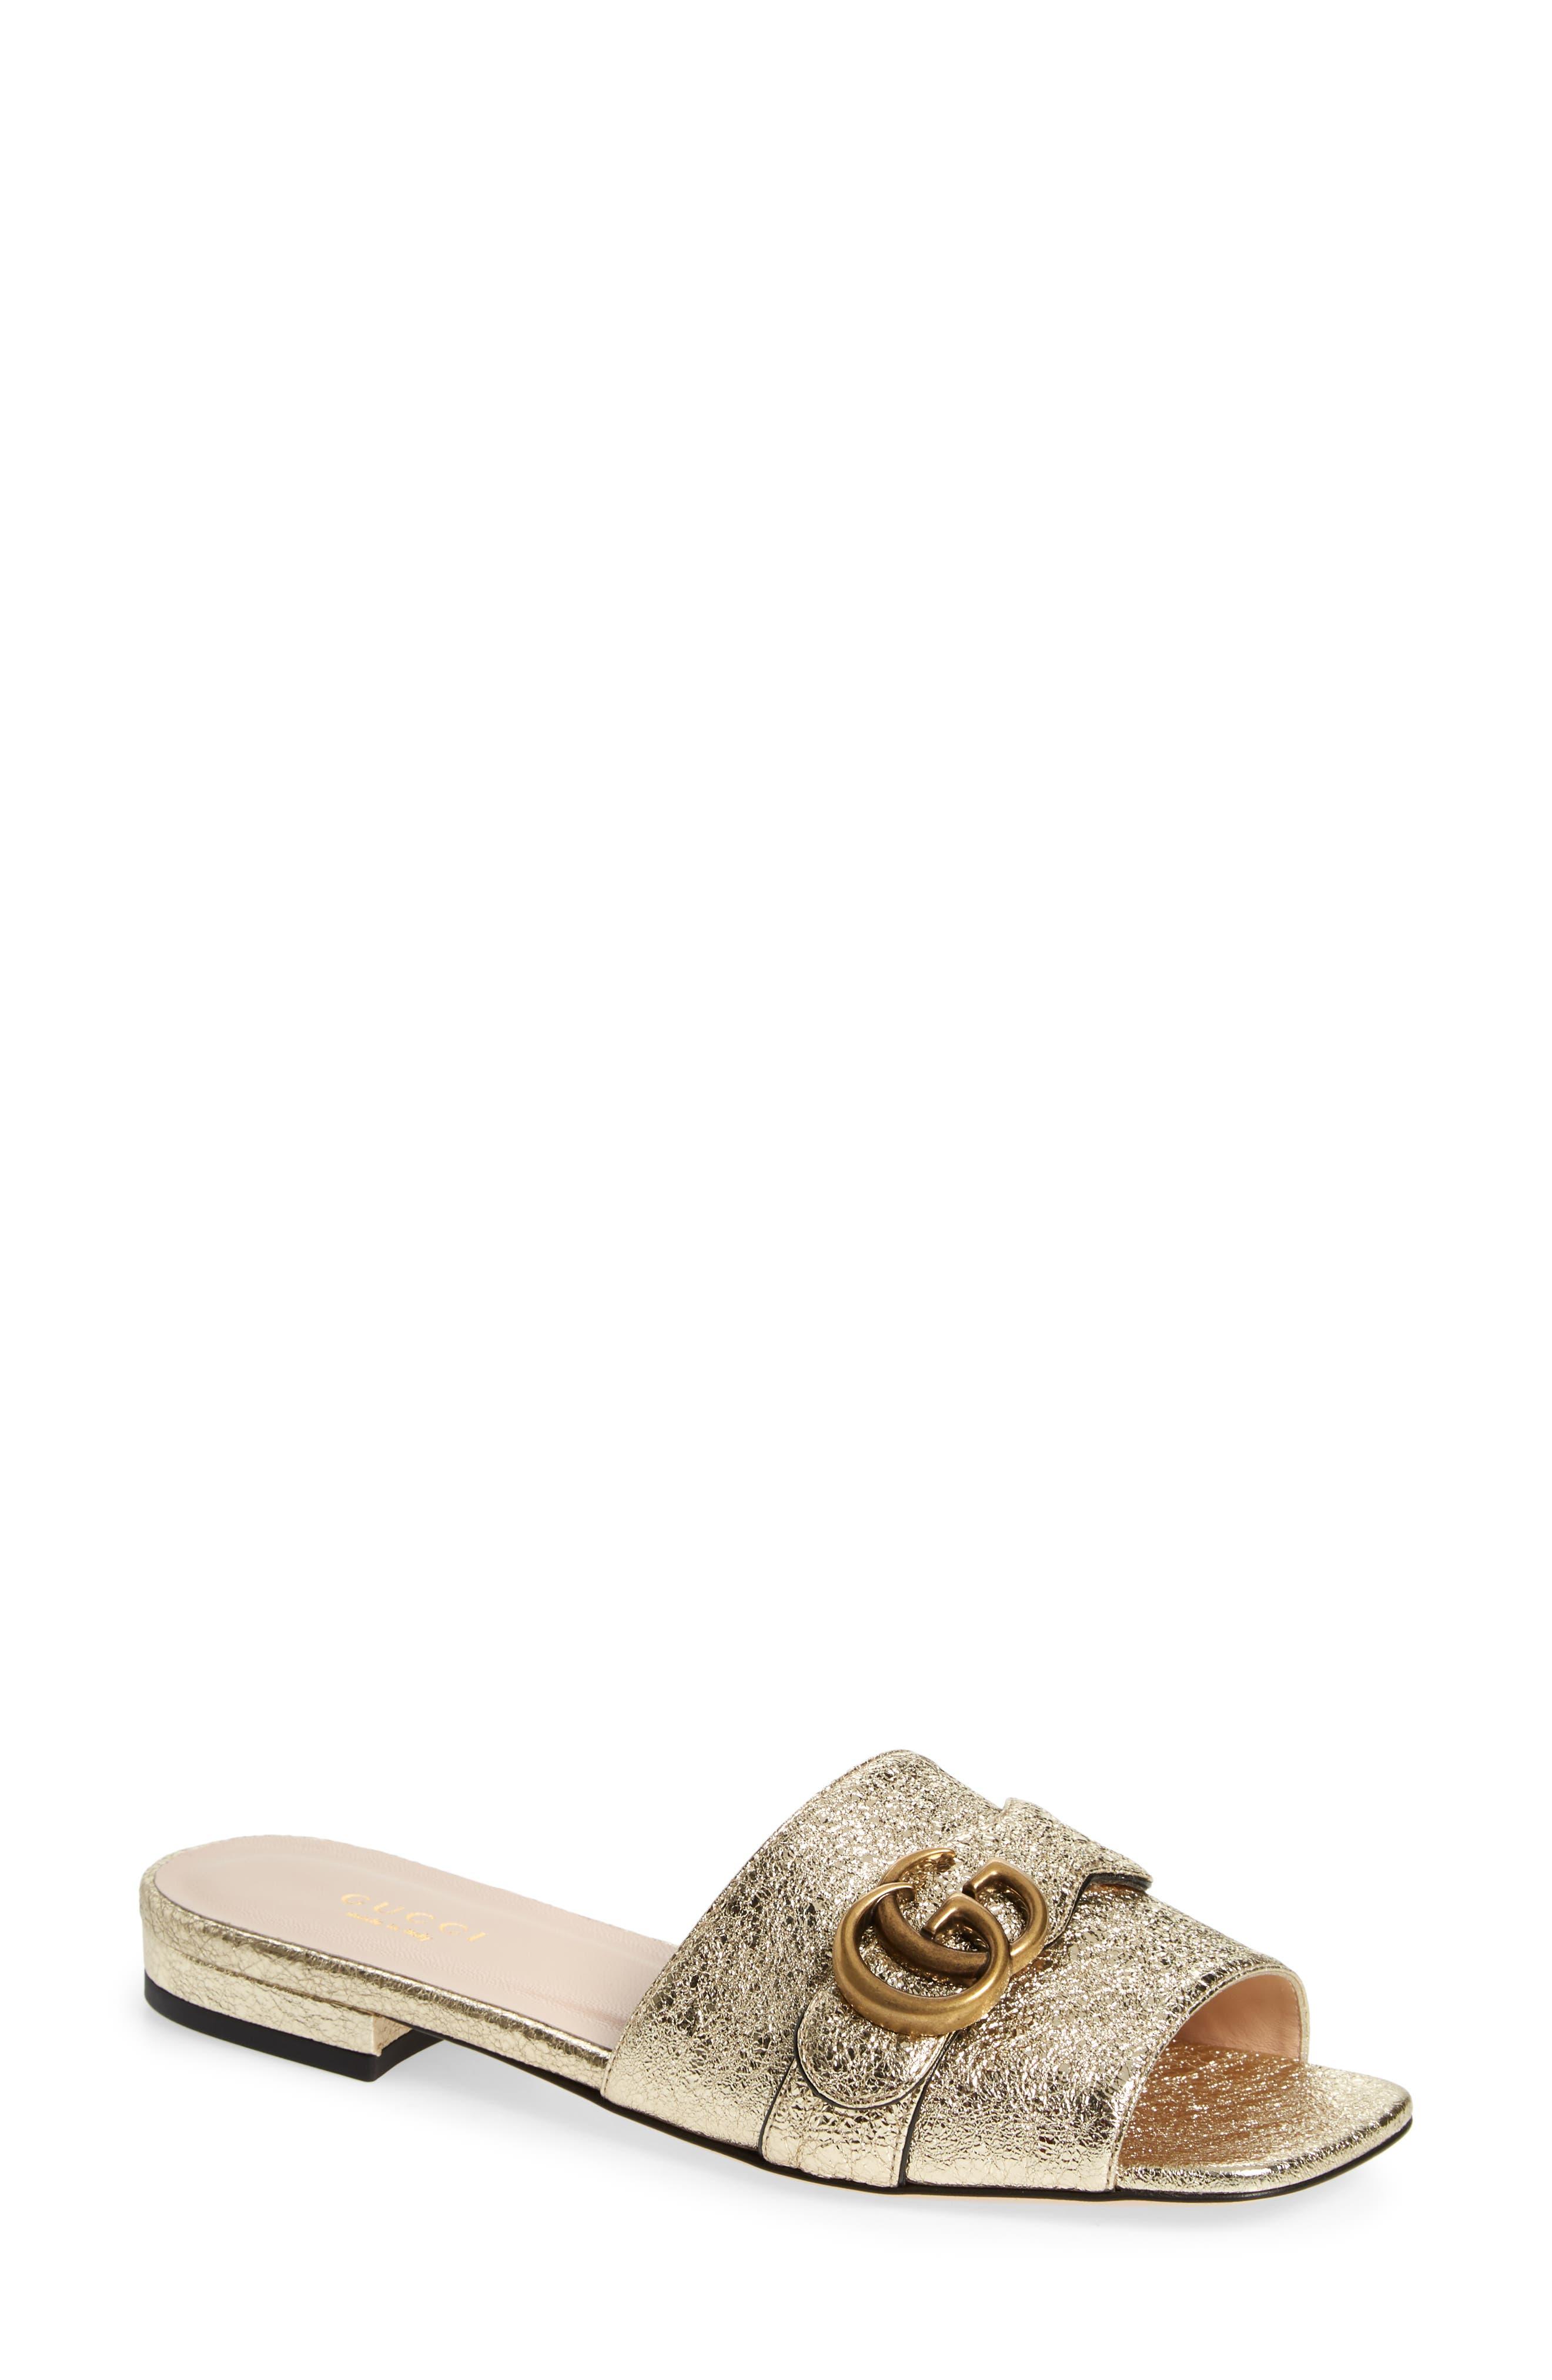 Women's Gucci Designer Shoes | Nordstrom